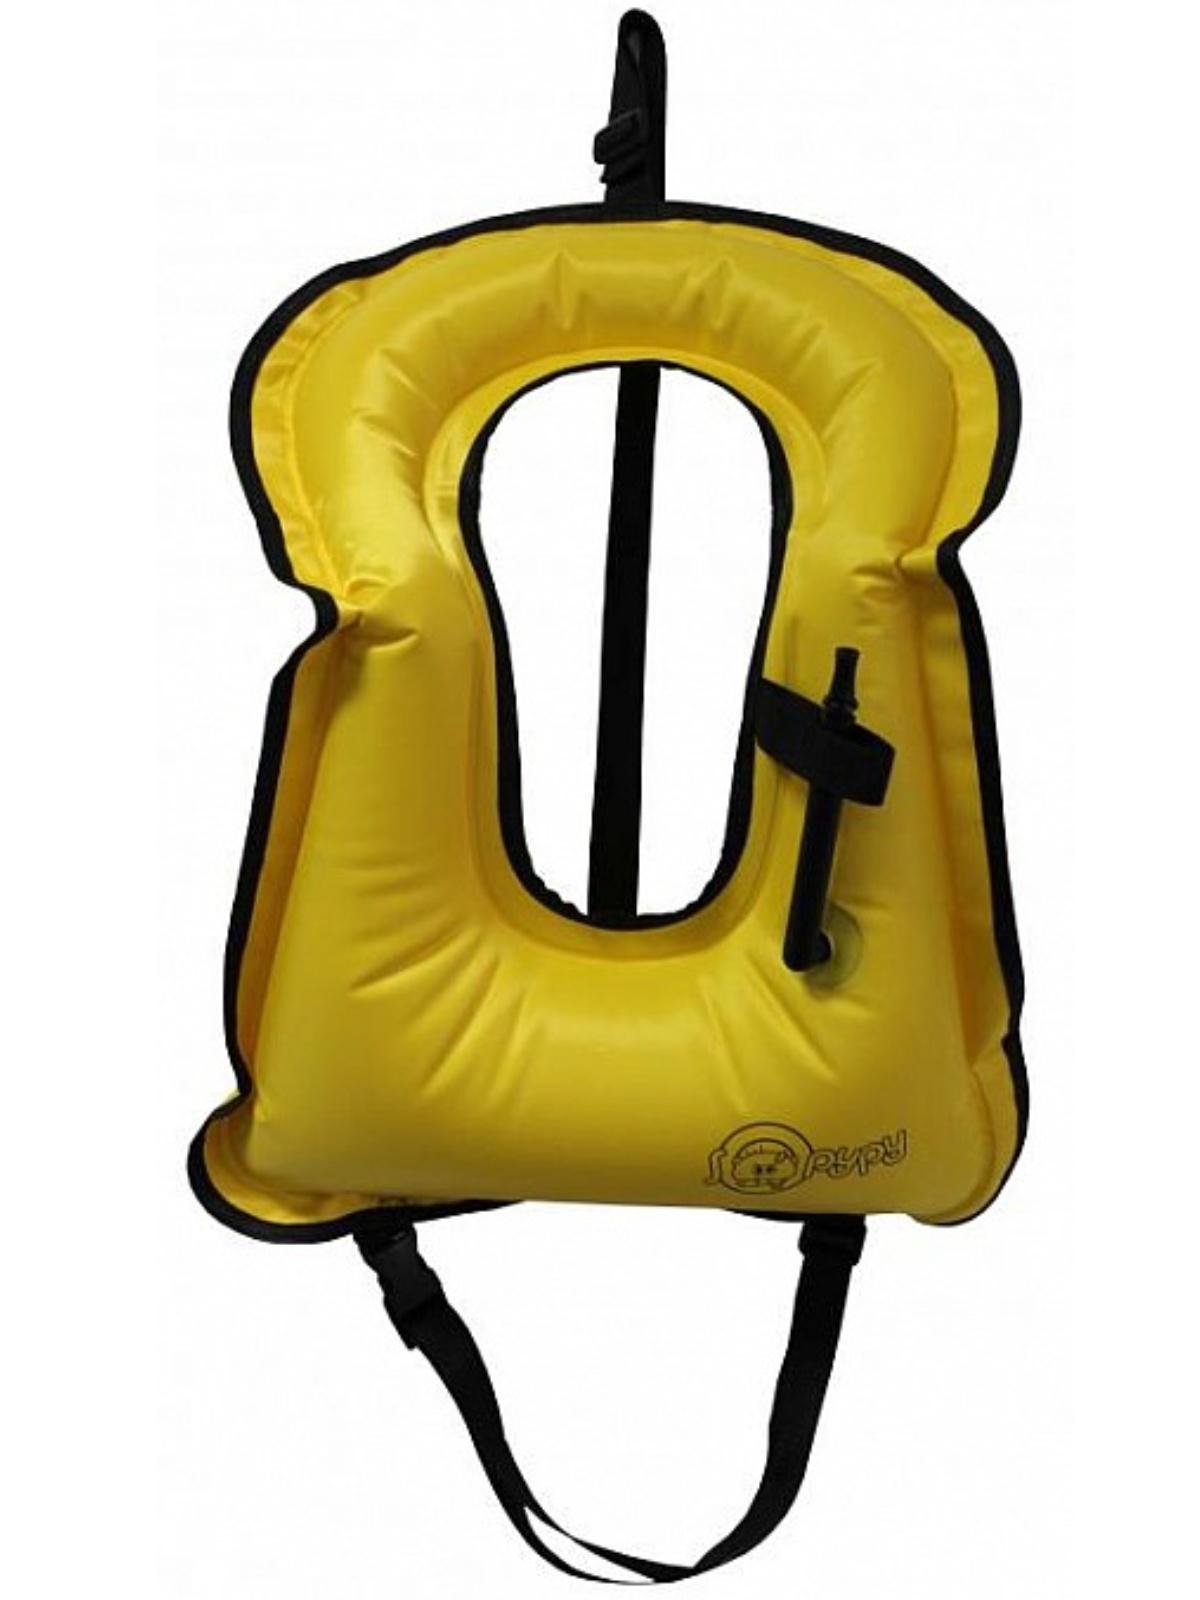 Šnorchlovací vesta AGAMA Pillow